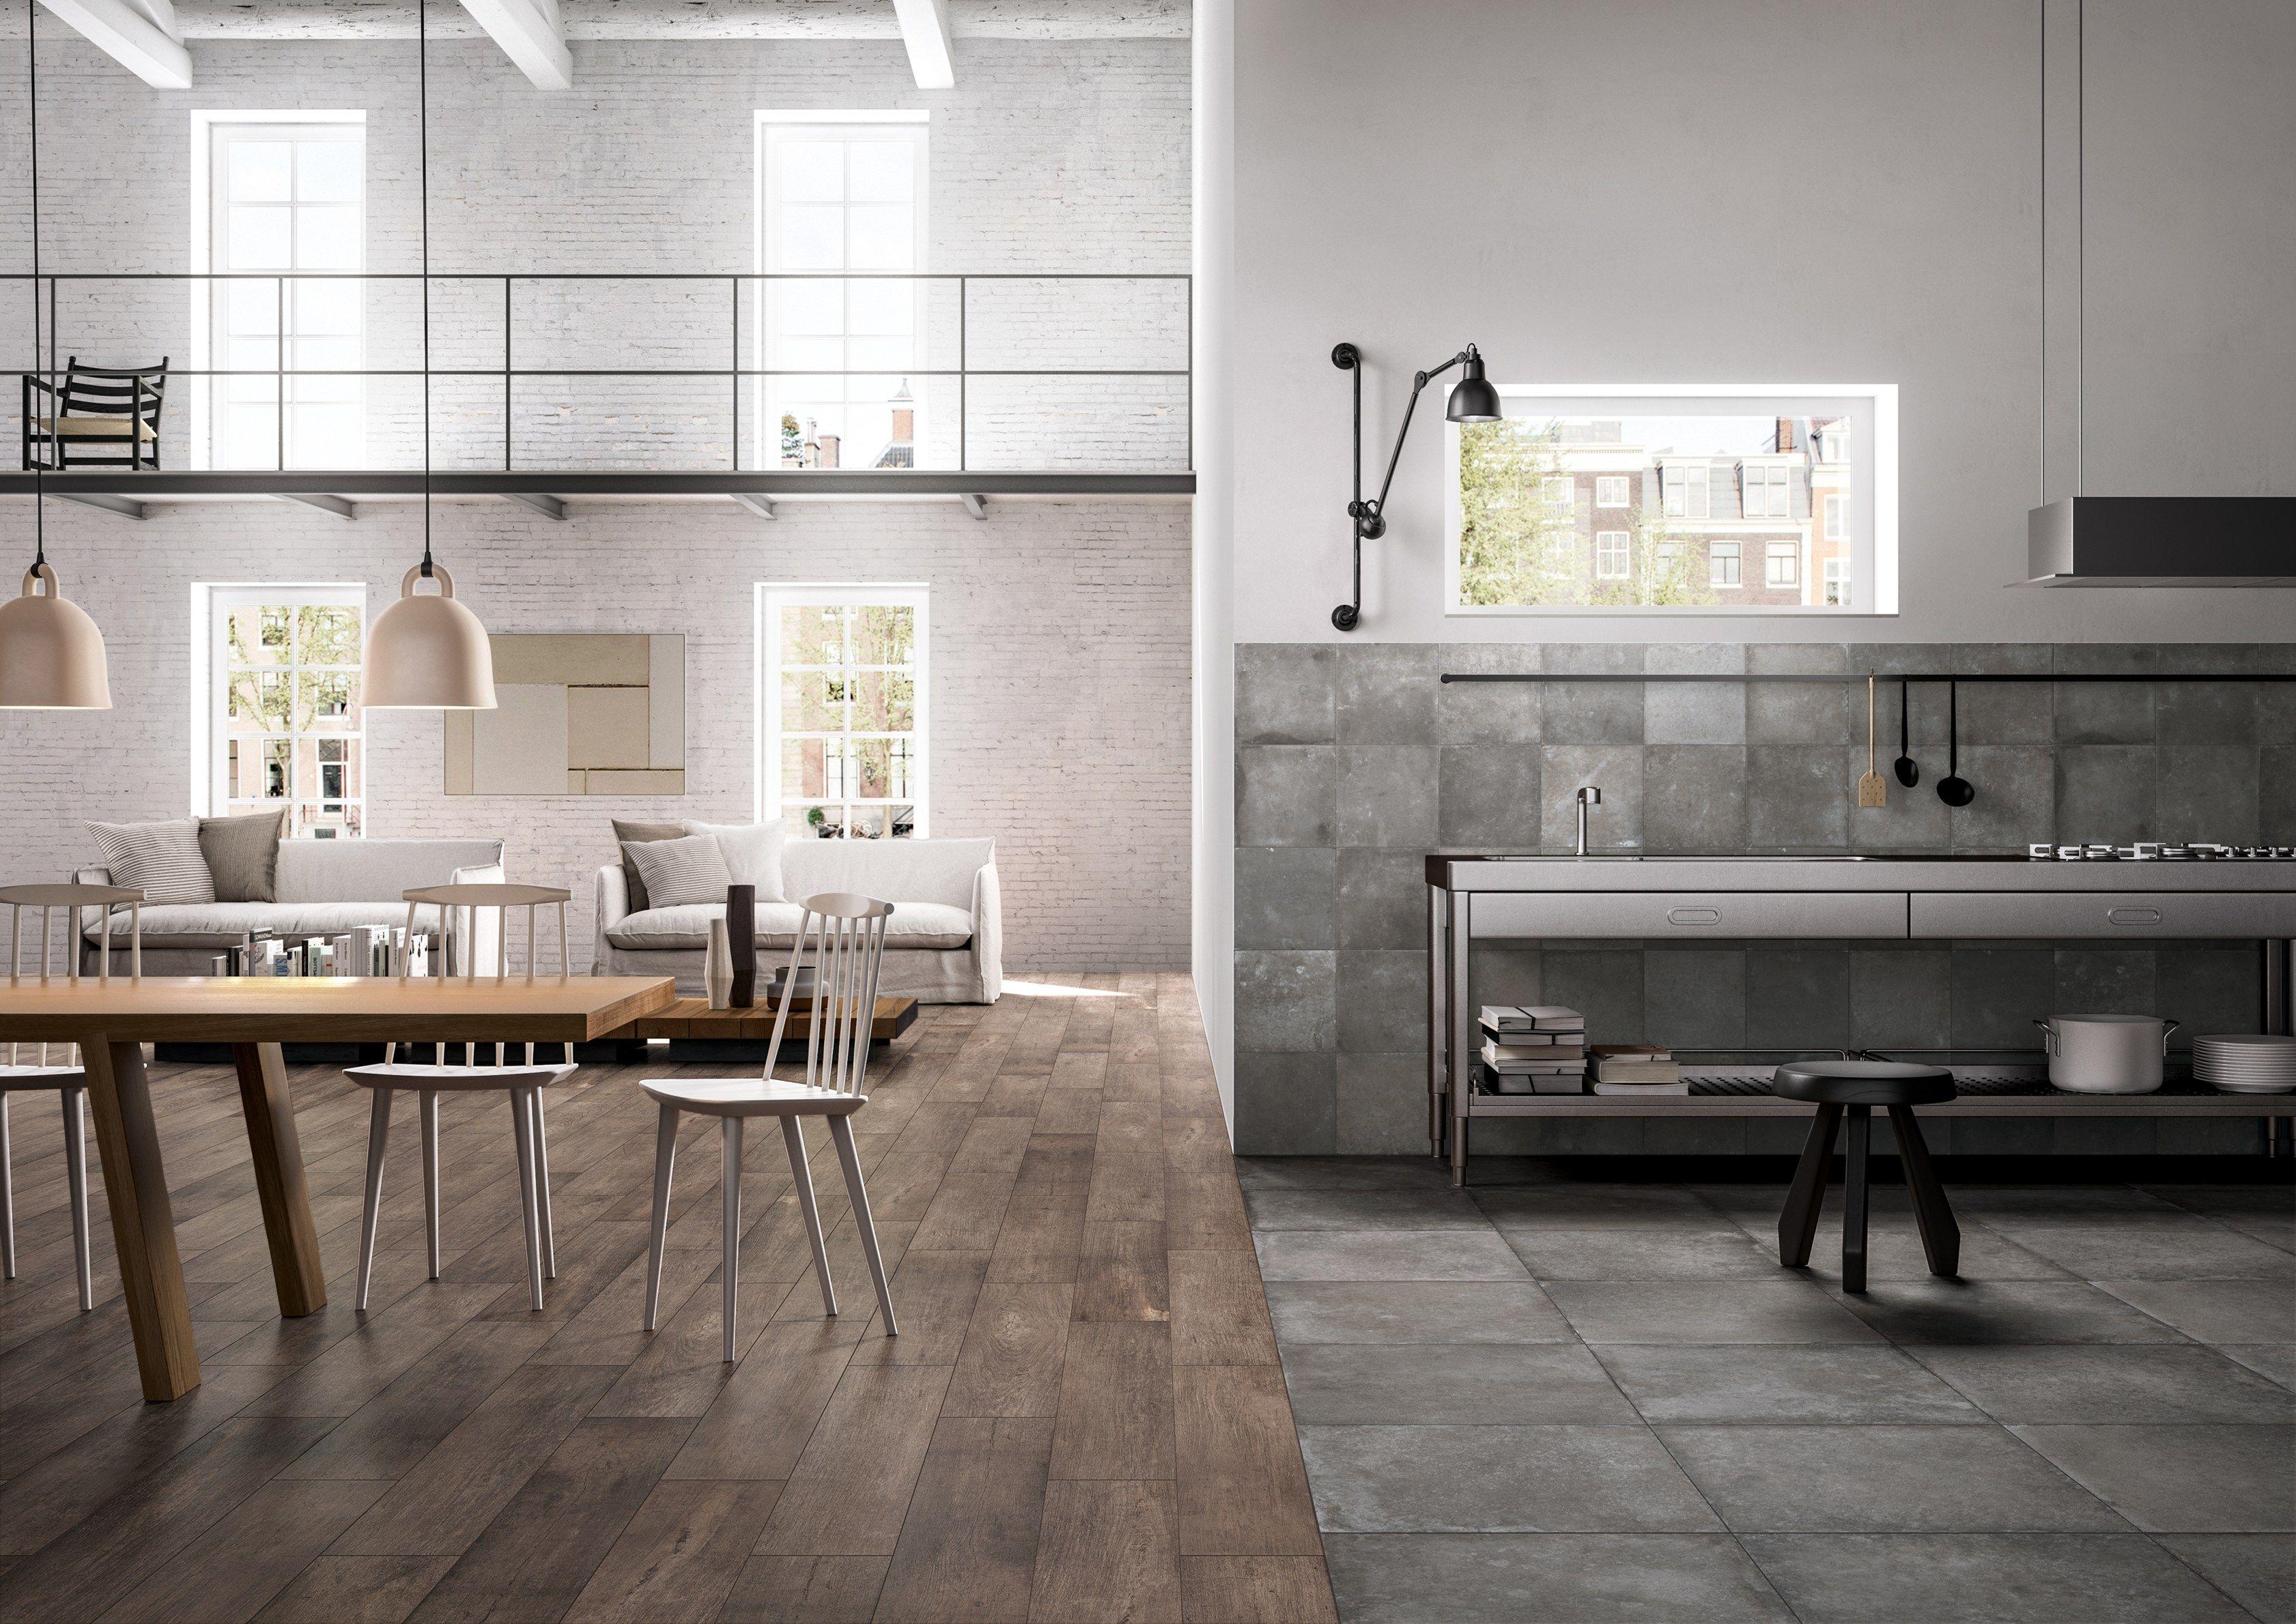 porcelain stoneware wall floor tiles epoque beton by. Black Bedroom Furniture Sets. Home Design Ideas